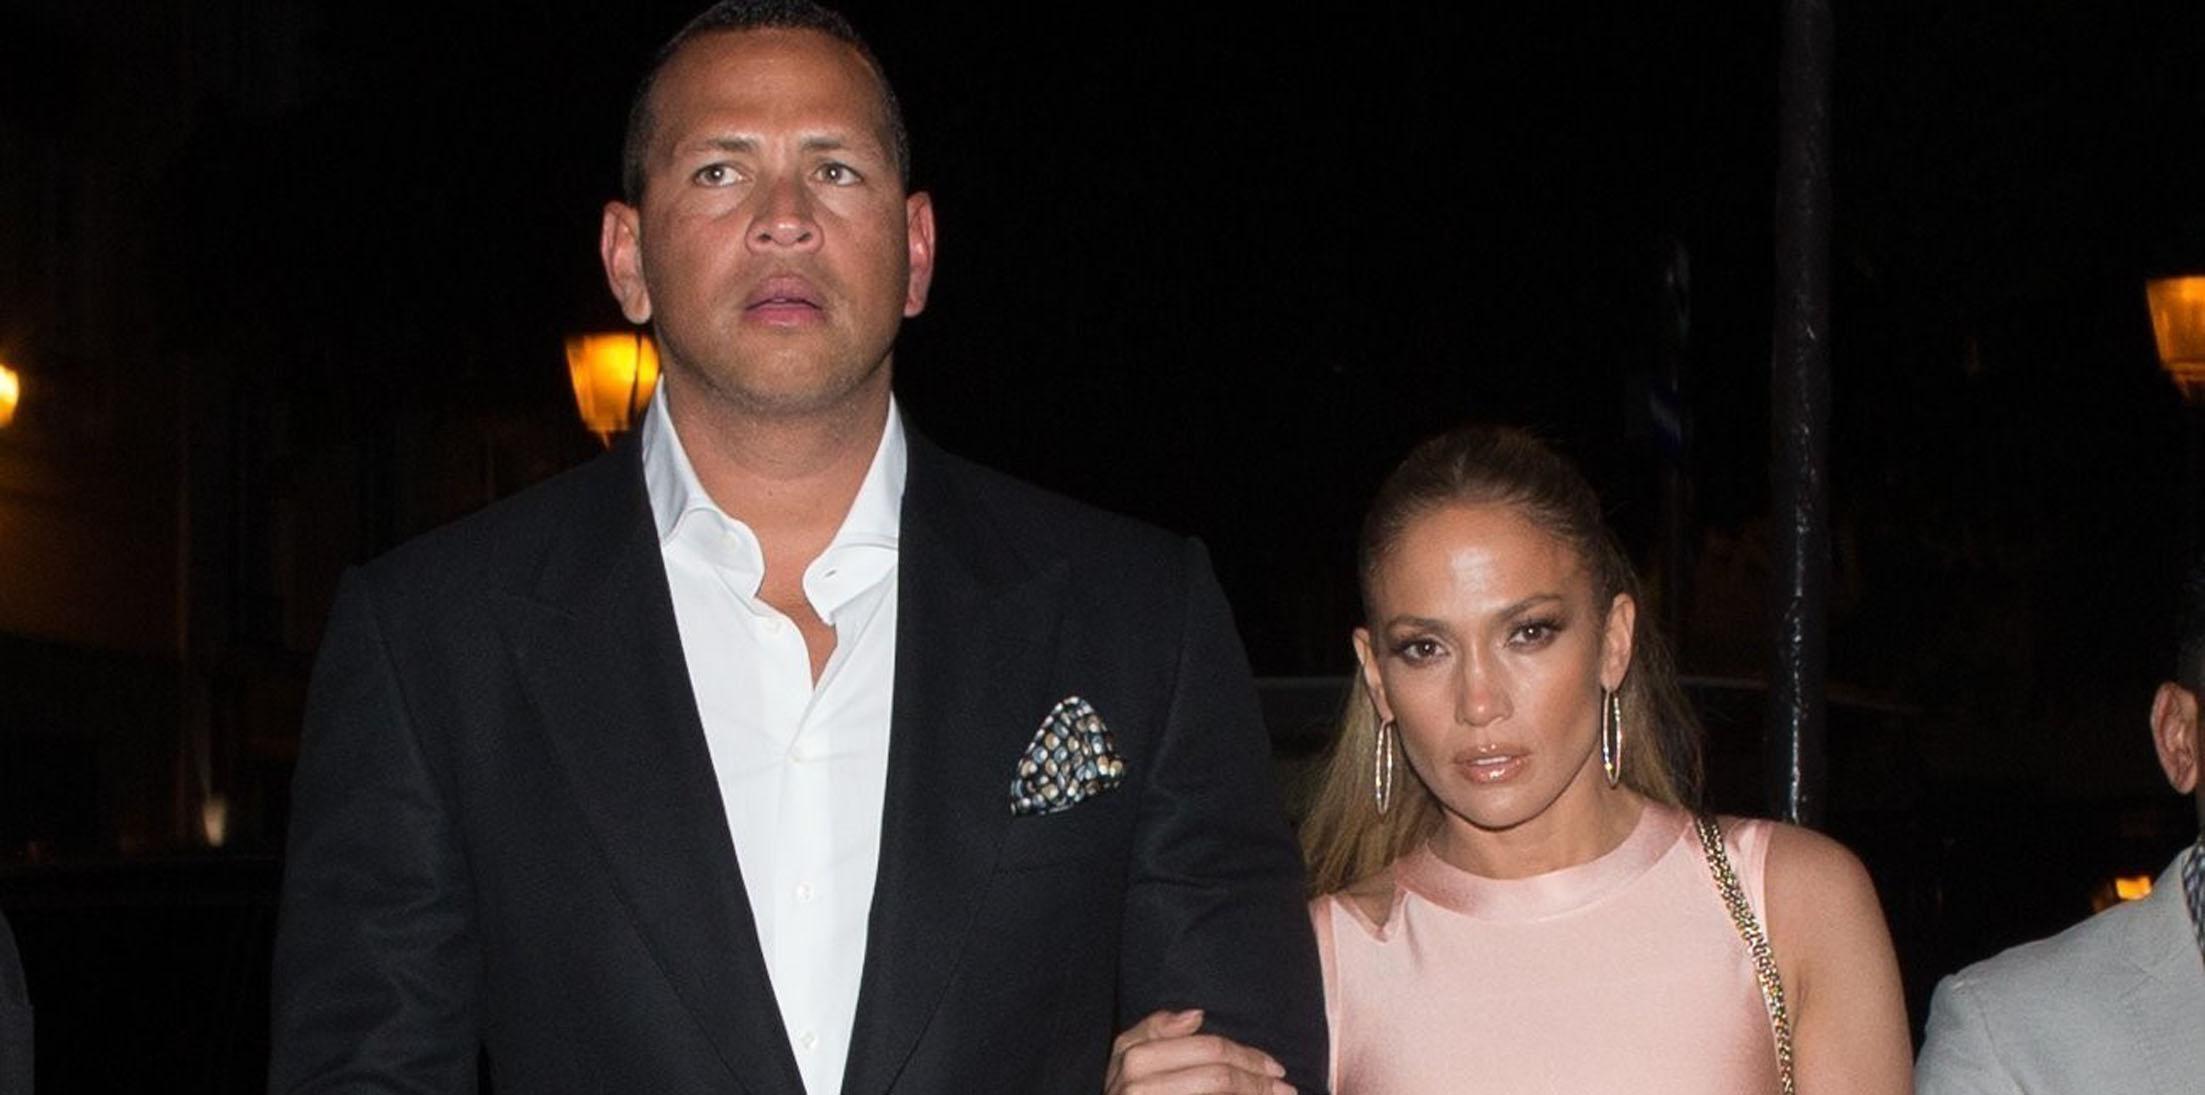 *EXCLUSIVE* Jennifer Lopez and Alex Rodriguez arrive for a date night at La Societe